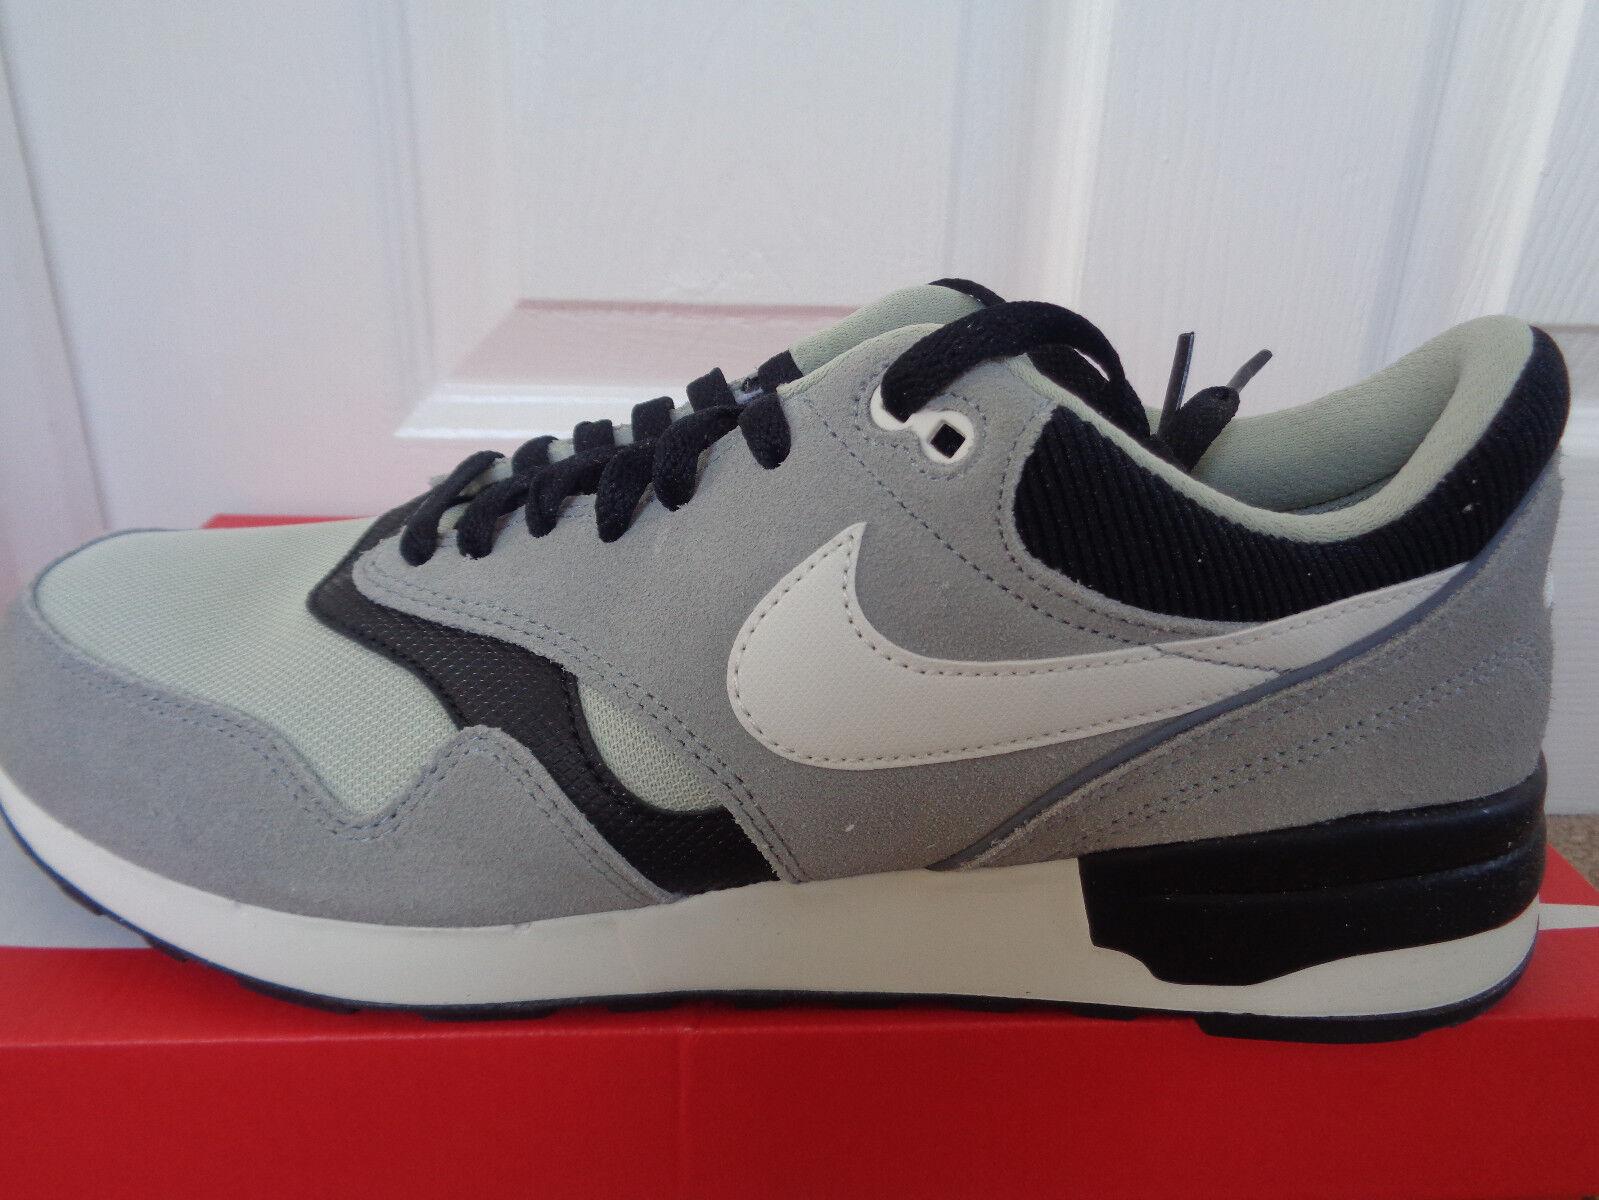 Nike Air Odyssey trainers schuhe 652989 011 uk 9.5 eu 44.5 us 10.5 NEW+BOX